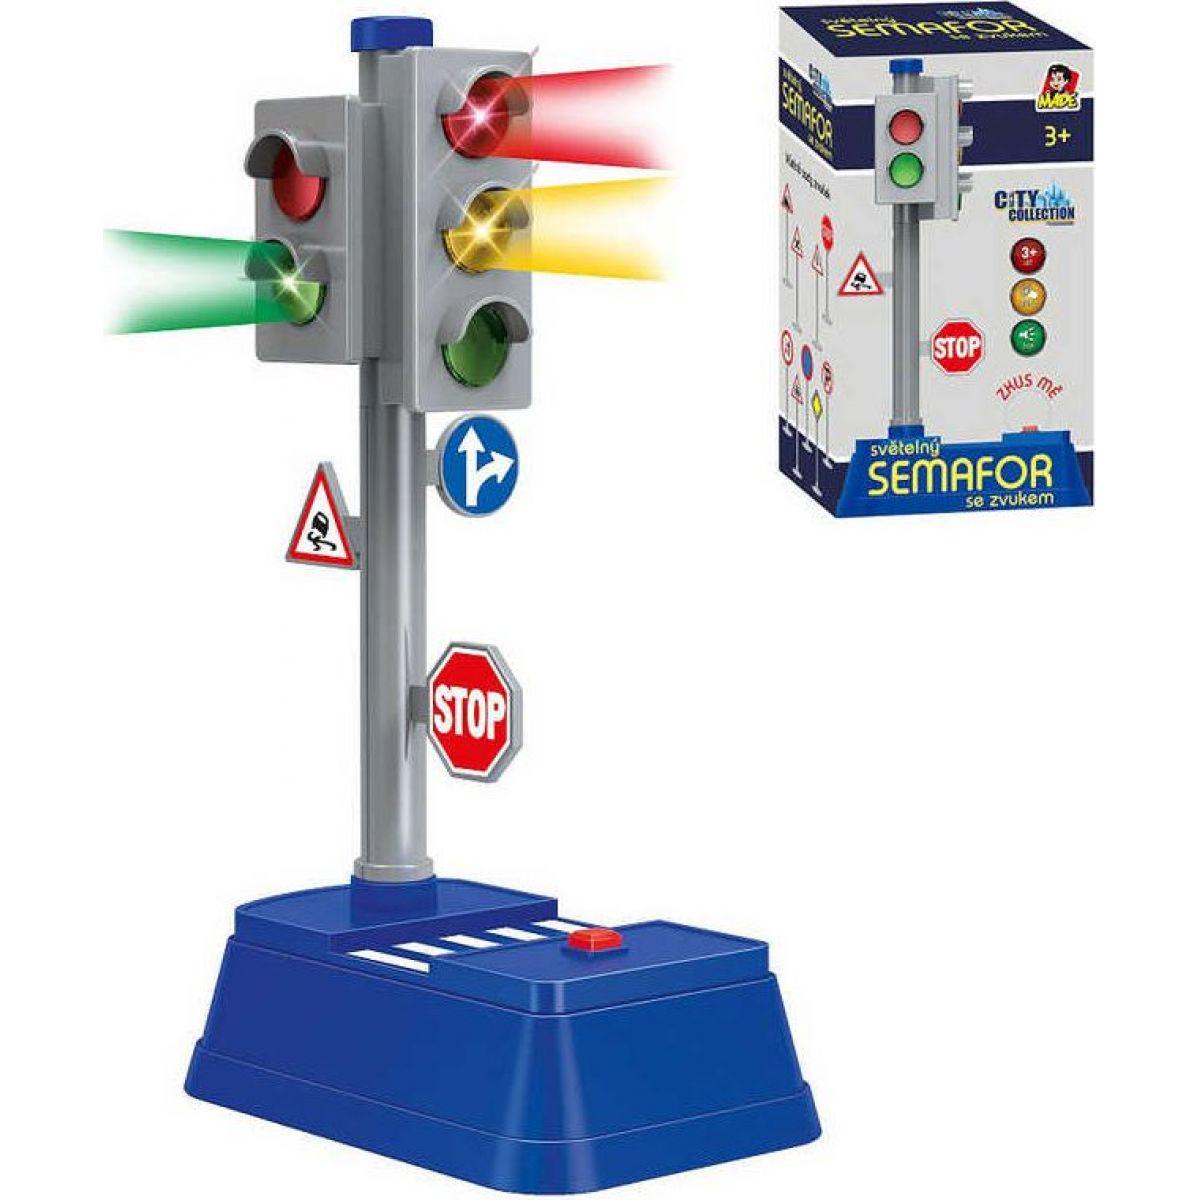 Made Set semafor se značkami 24 x 14 cm